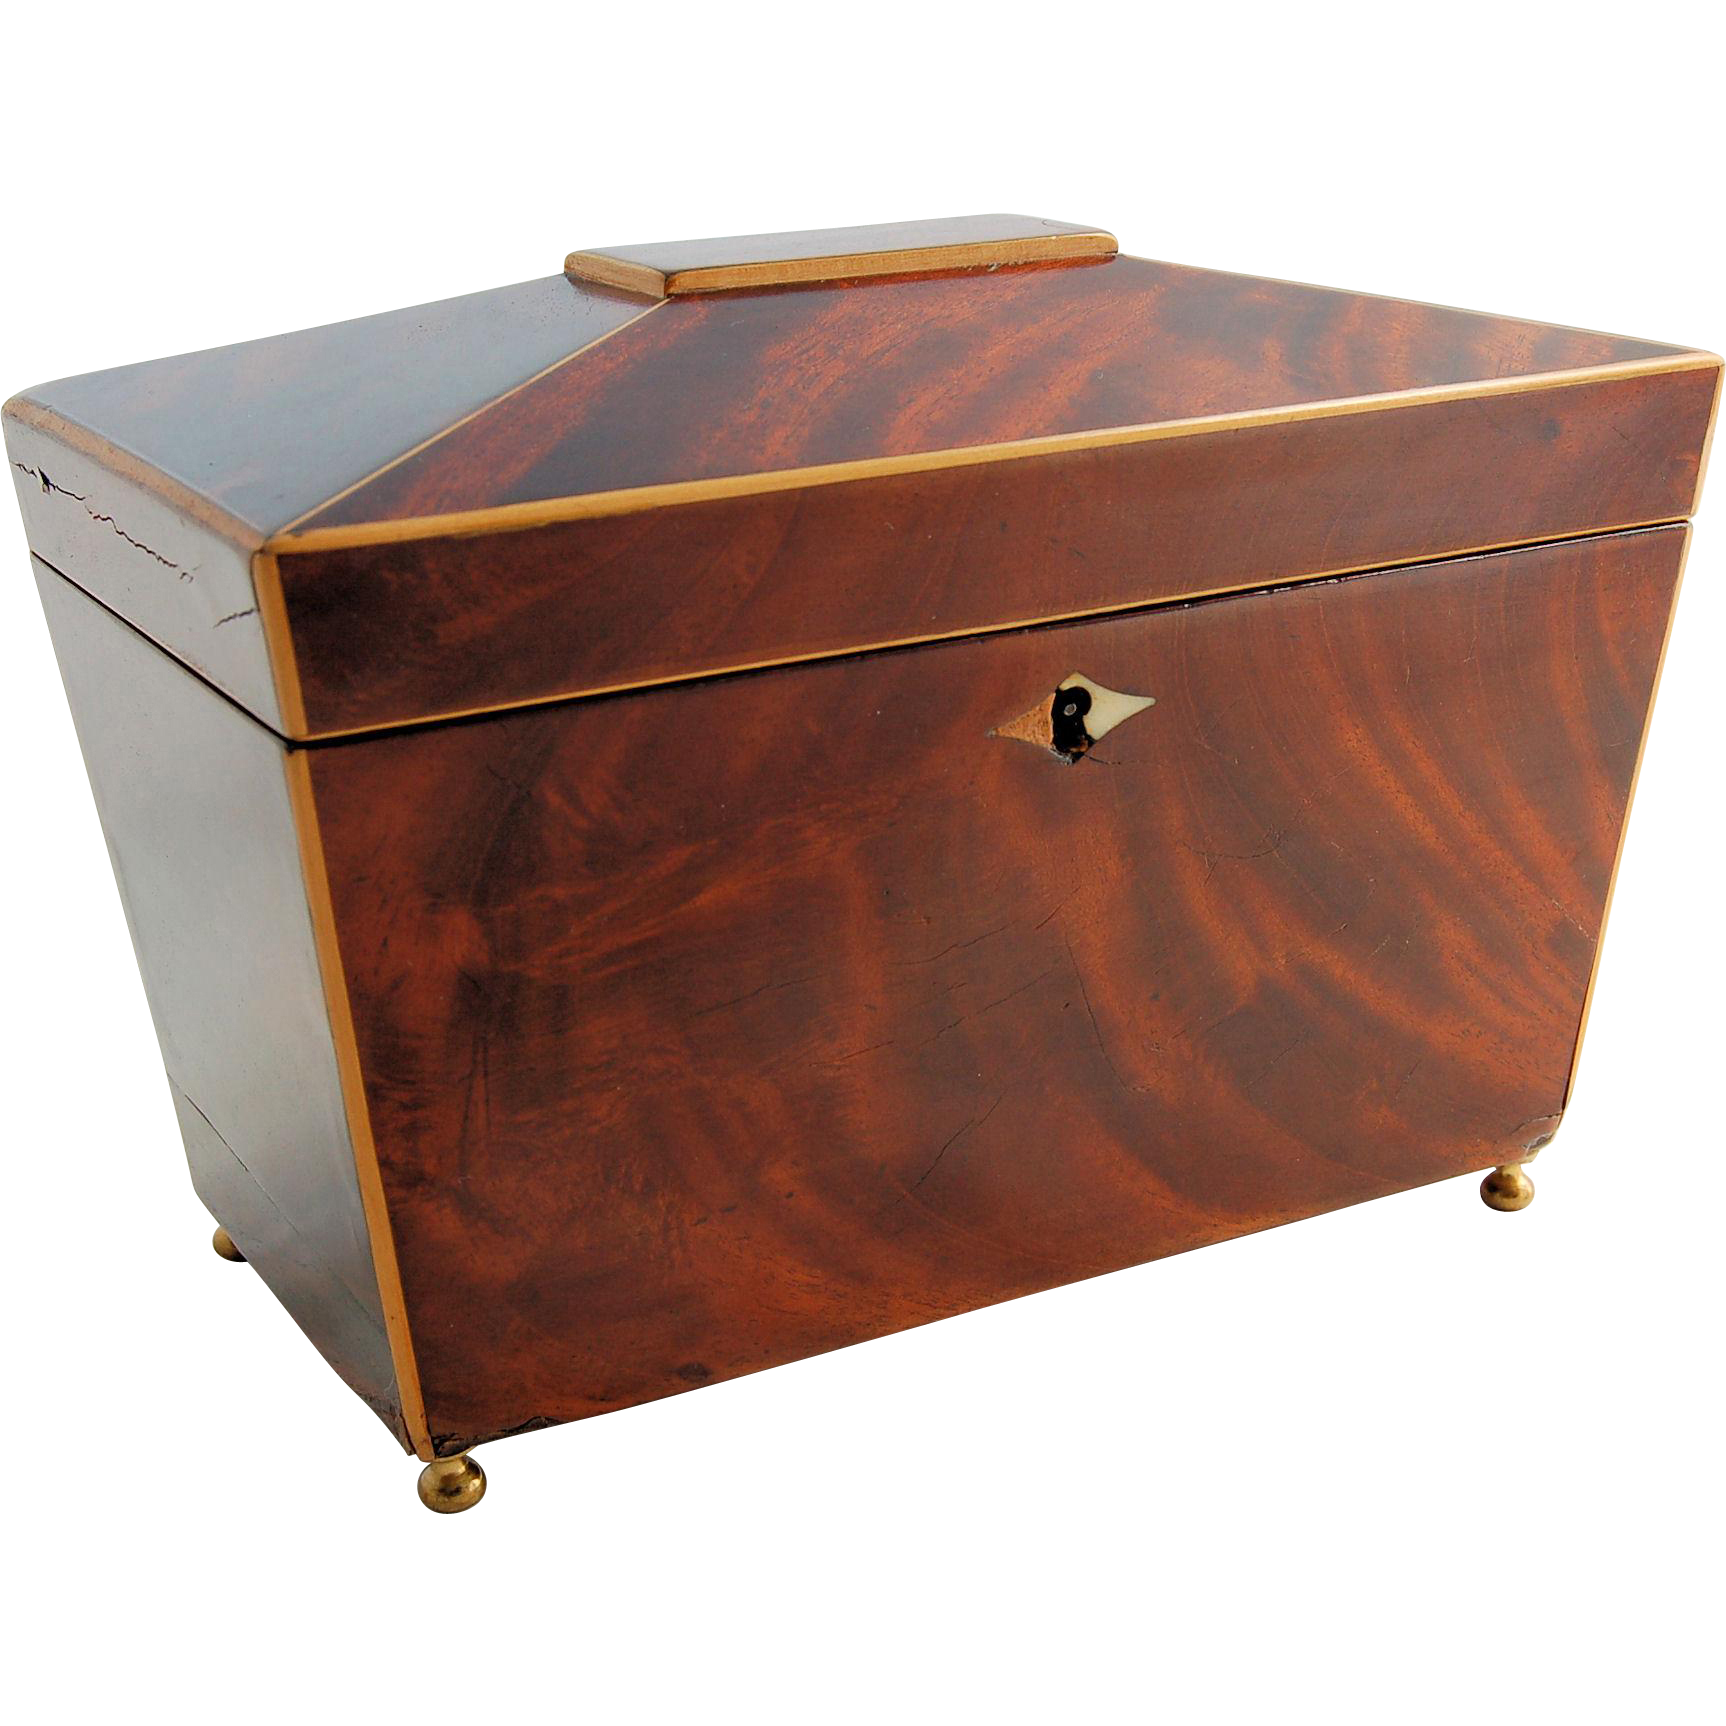 Antique Wooden Tea Caddy Mahogany Walnut Inlay Escutcheon Lock Sarcophagus Shape